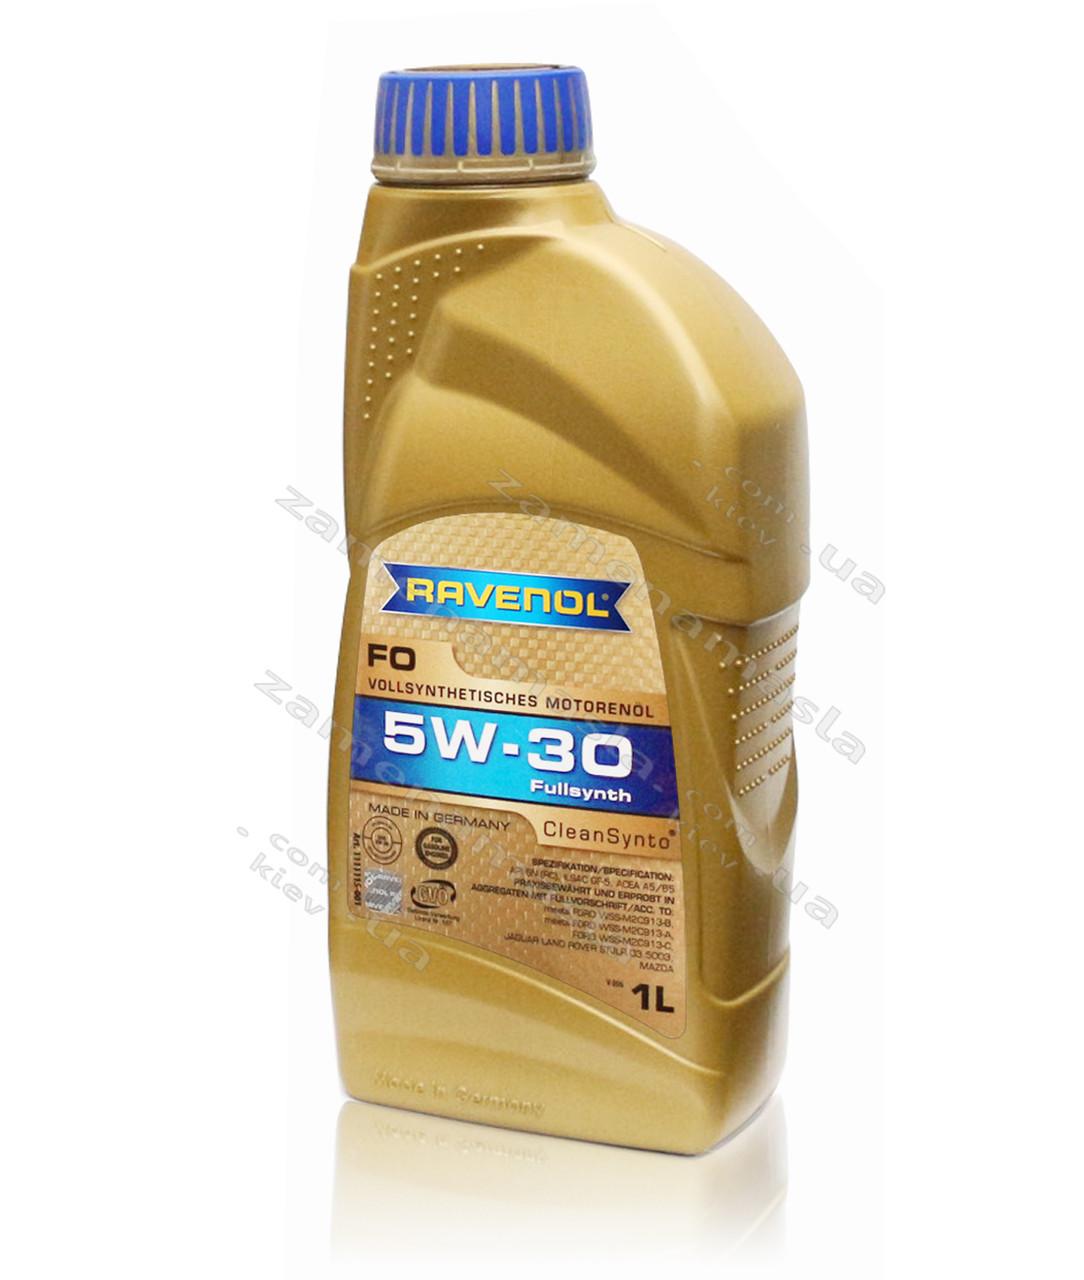 Ravenol FO 5W-30 1л - моторное масло